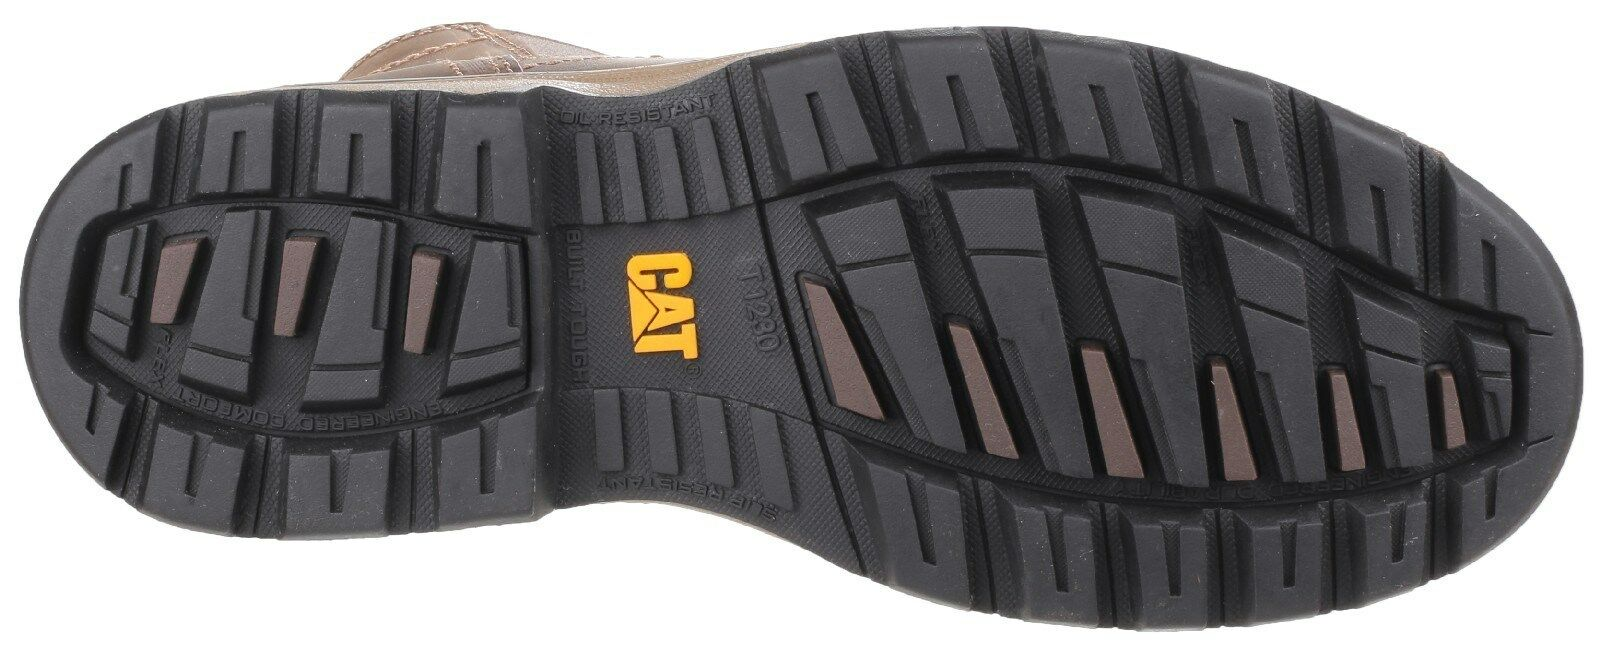 Cat Caterpillar Pelton Sicherheit Dealer Stiefel Herren Industrie Arbeit Schuhe UK6 12